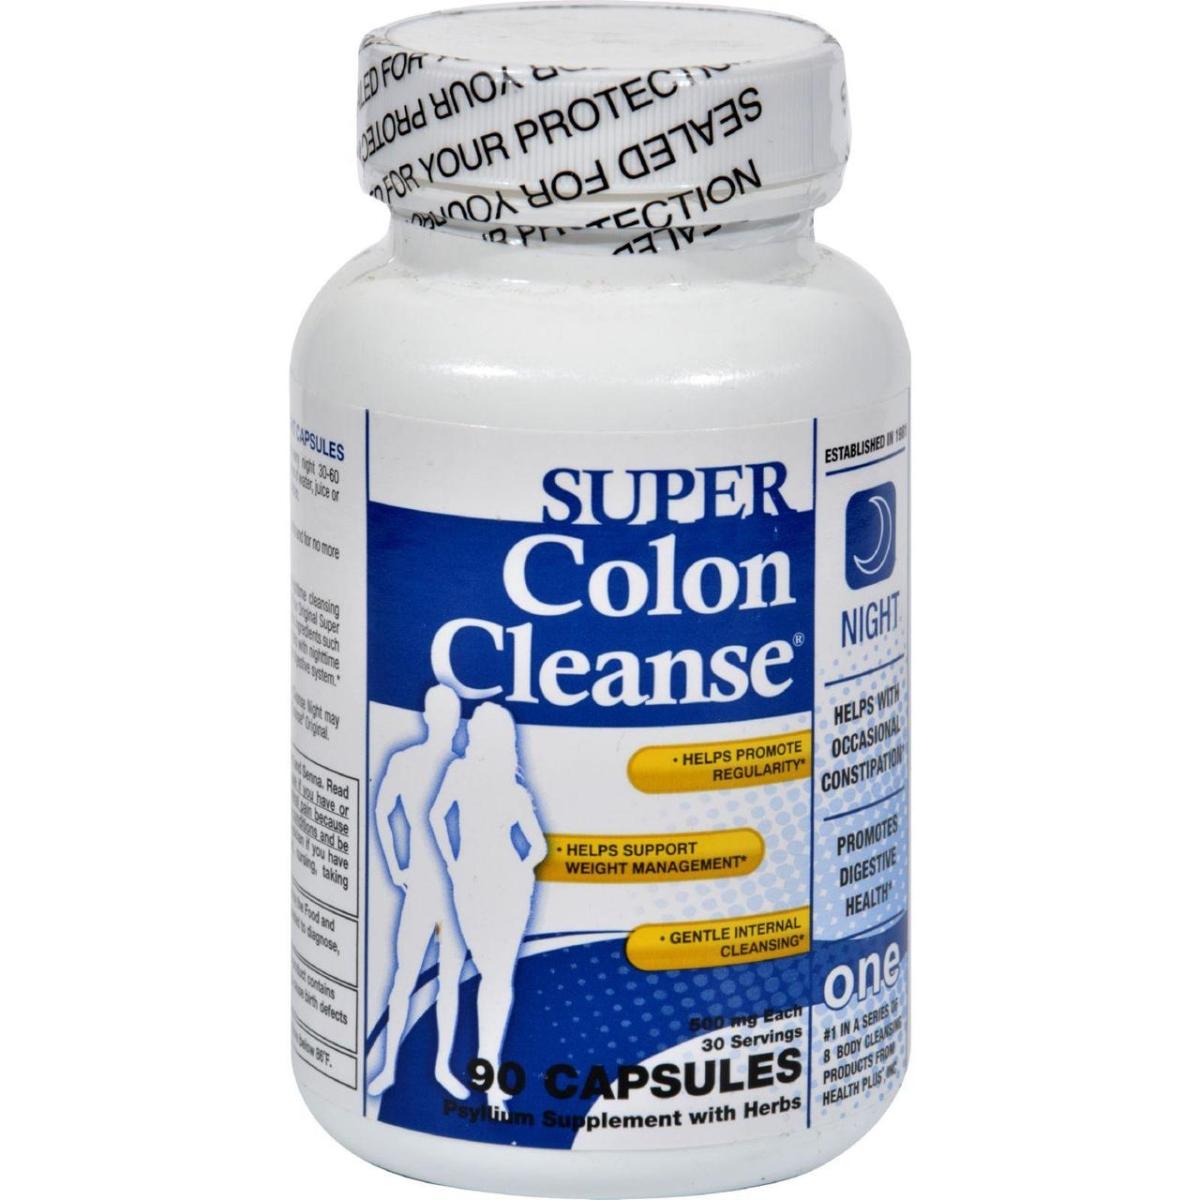 Health Plus HG0528679 Super Colon Cleanse Night Formula - 90 Capsules